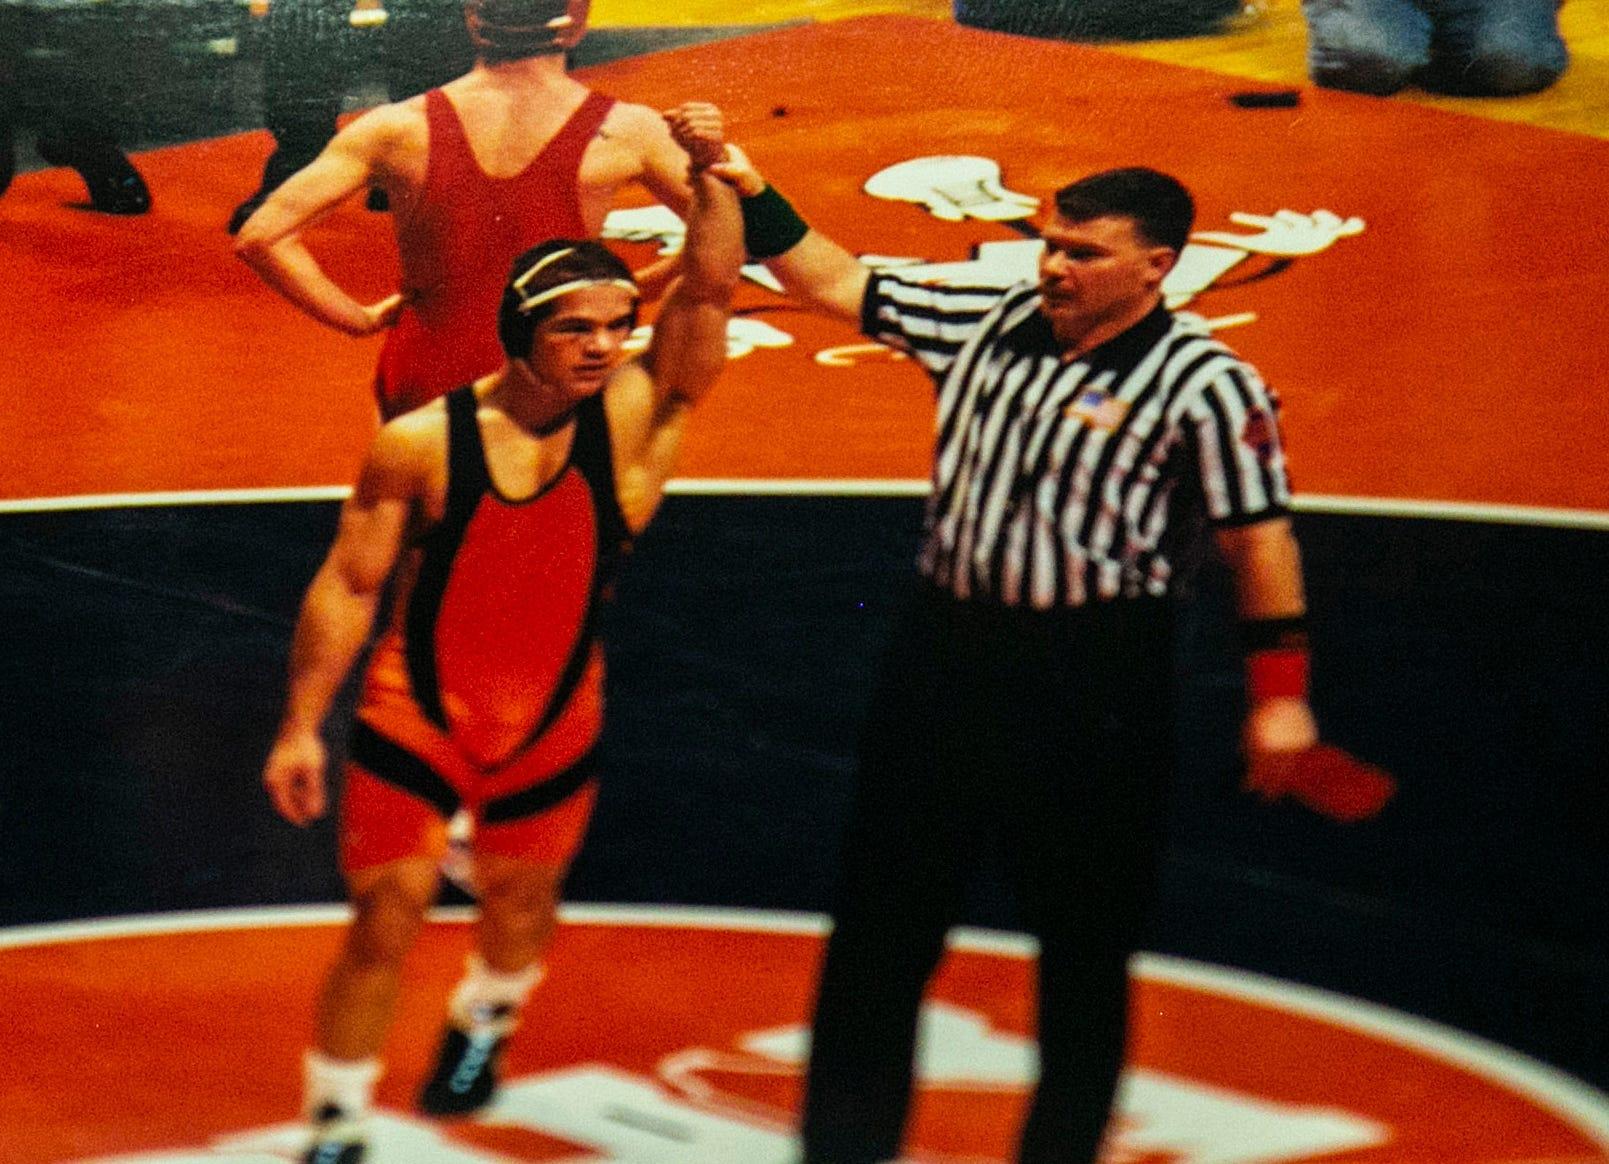 Lambros Fotos spent the summer of 2001 honing his skills as a wrestler.